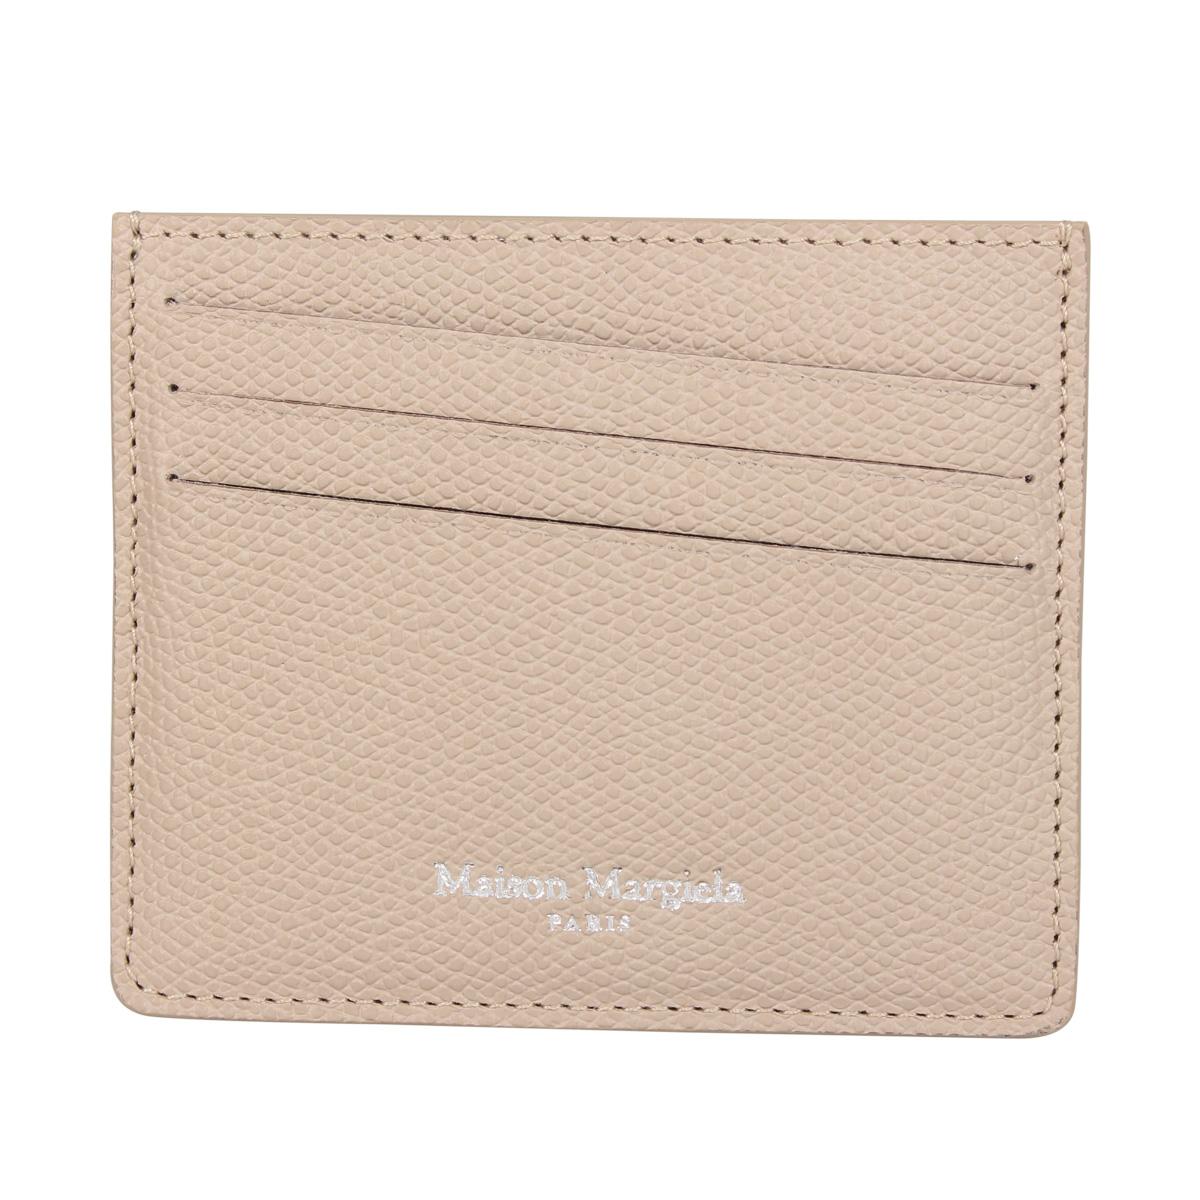 MAISON MARGIELA CARD CASE メゾンマルジェラ カードケース 名刺入れ 定期入れ メンズ レディース ベージュ S35UI0432-T2352 [3/4 新入荷]